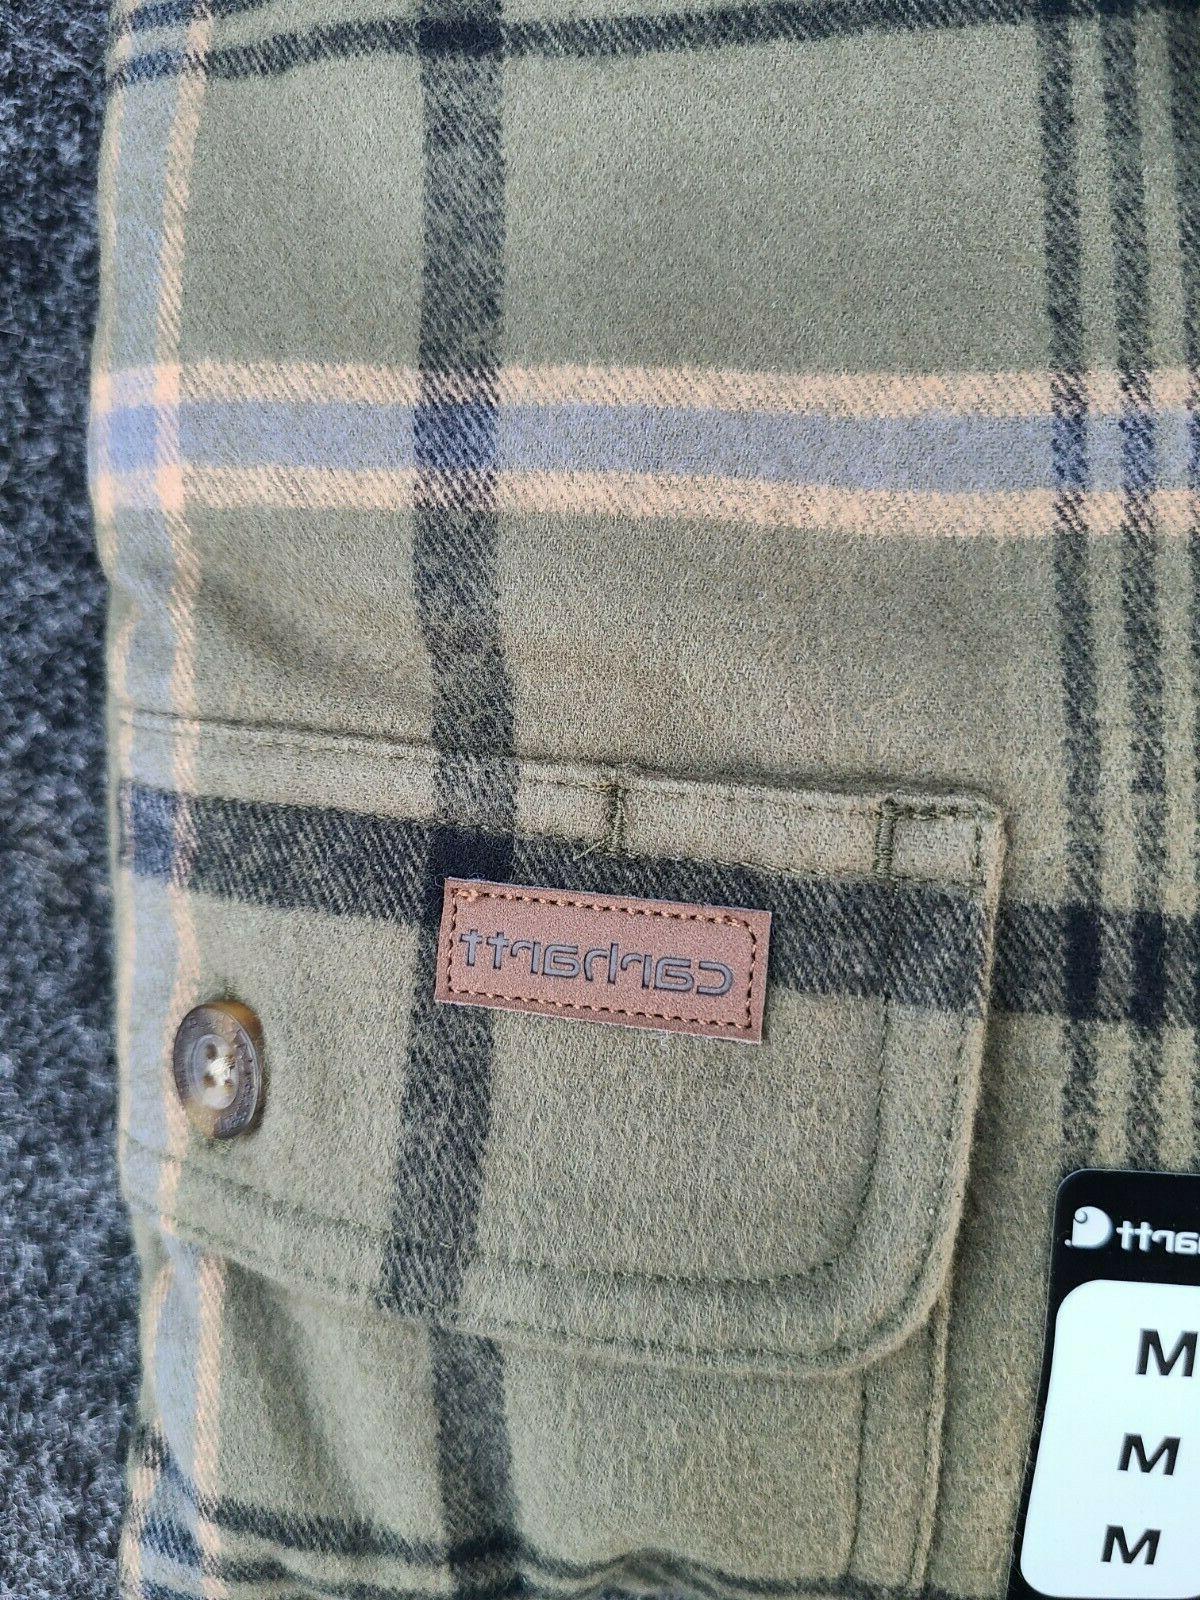 Carhartt Men's Long Sleeve Cotton 100% Pocket Shirts